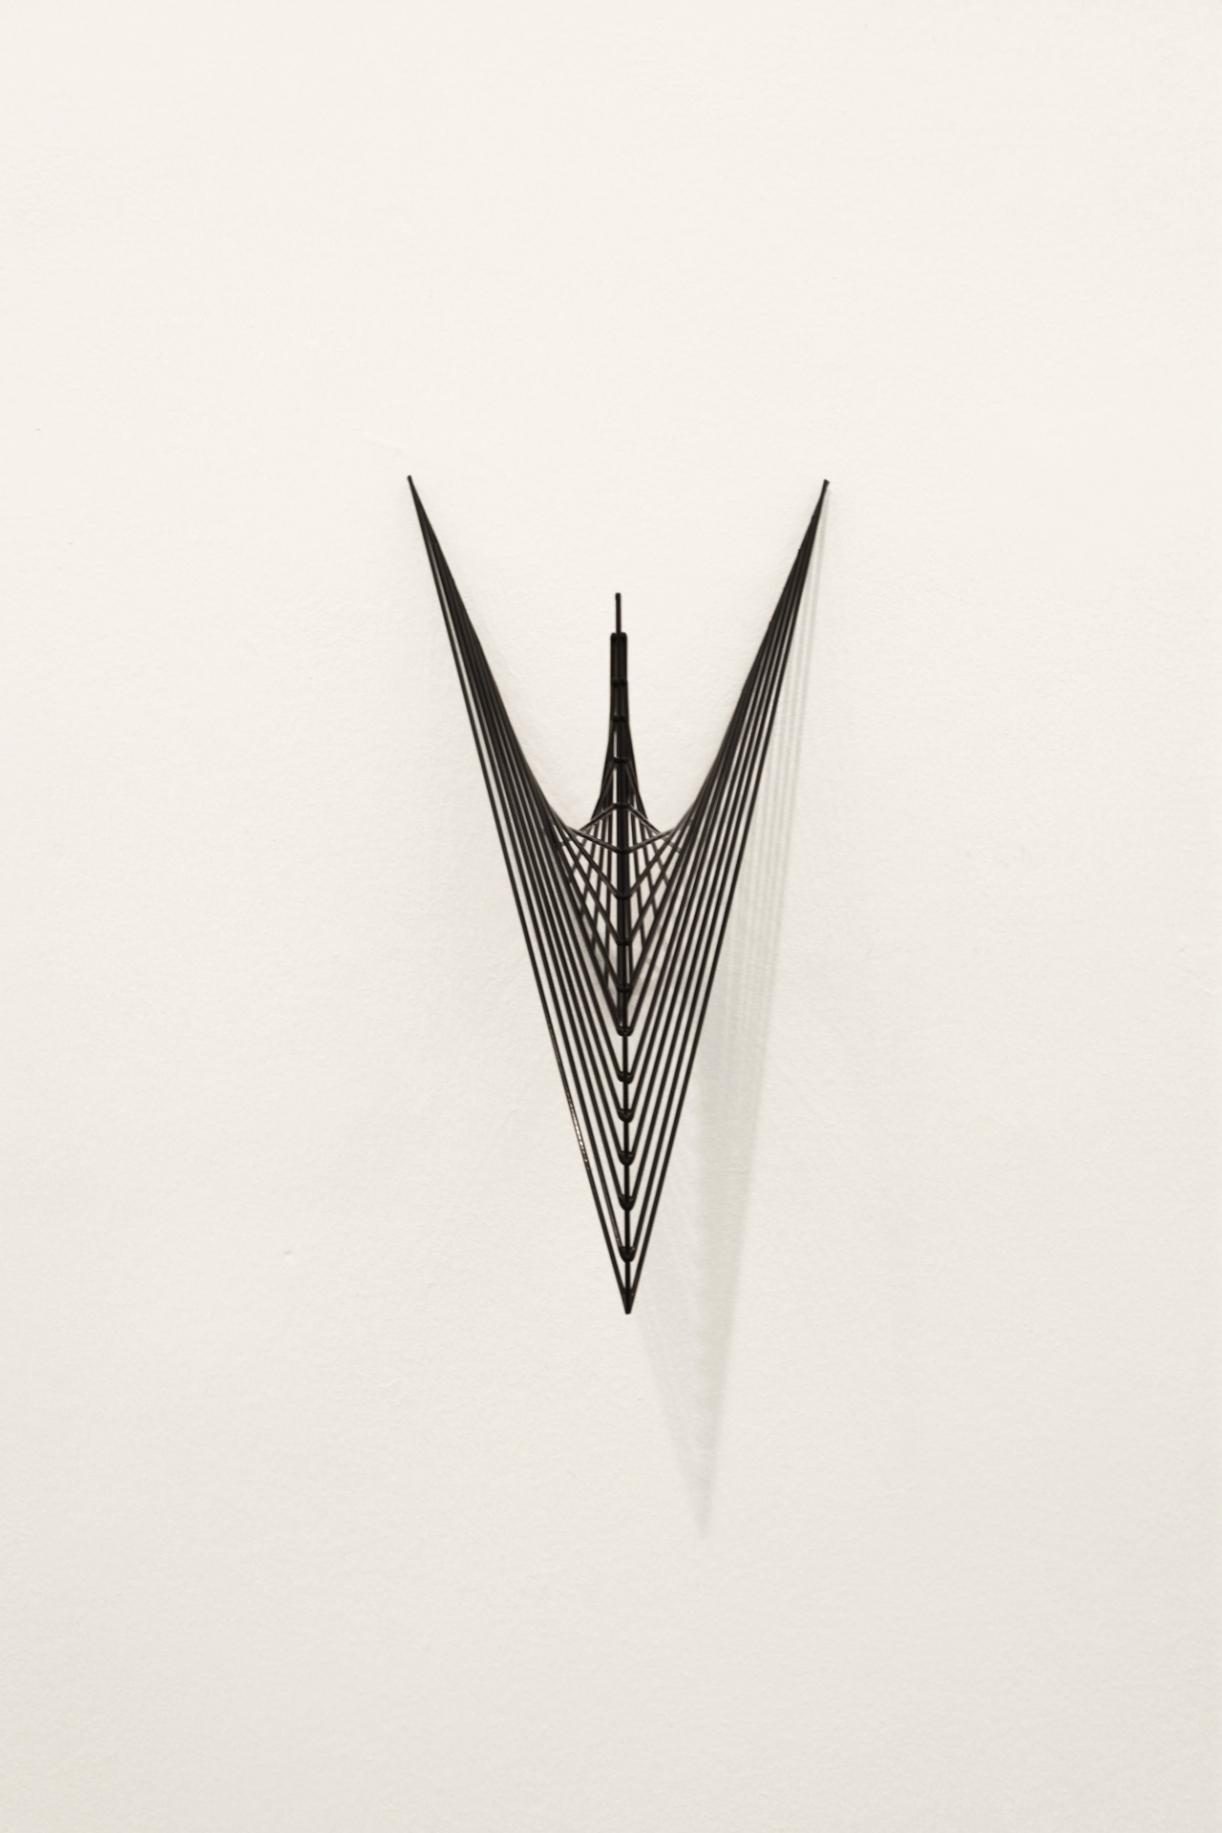 Timo Nasseri, Mesh #3, 2012, Steel, powder coated, 31 x 18 x 16 cm